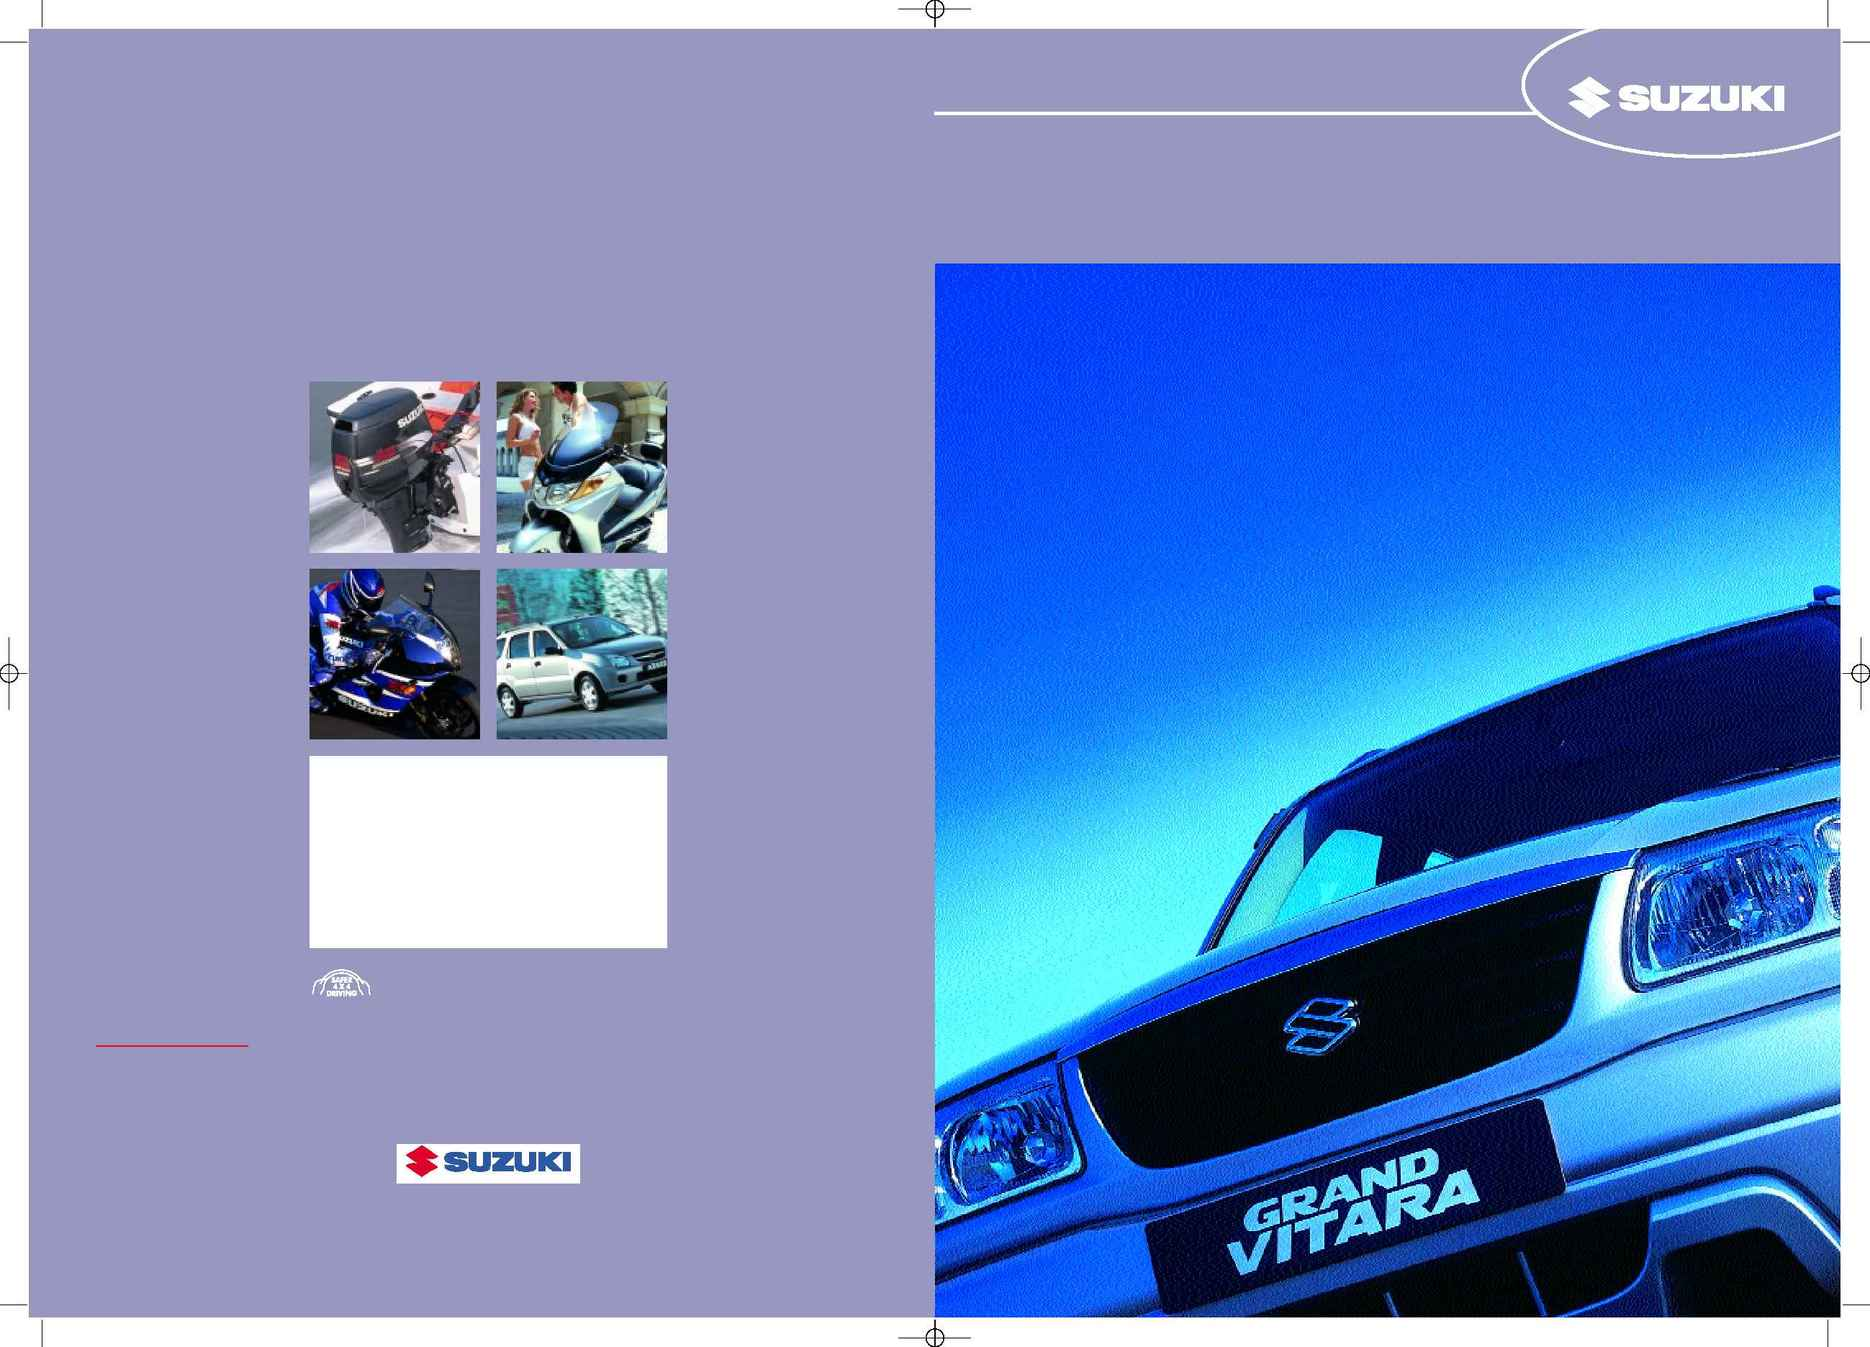 Suzuki - PDF Grand Vitara Range